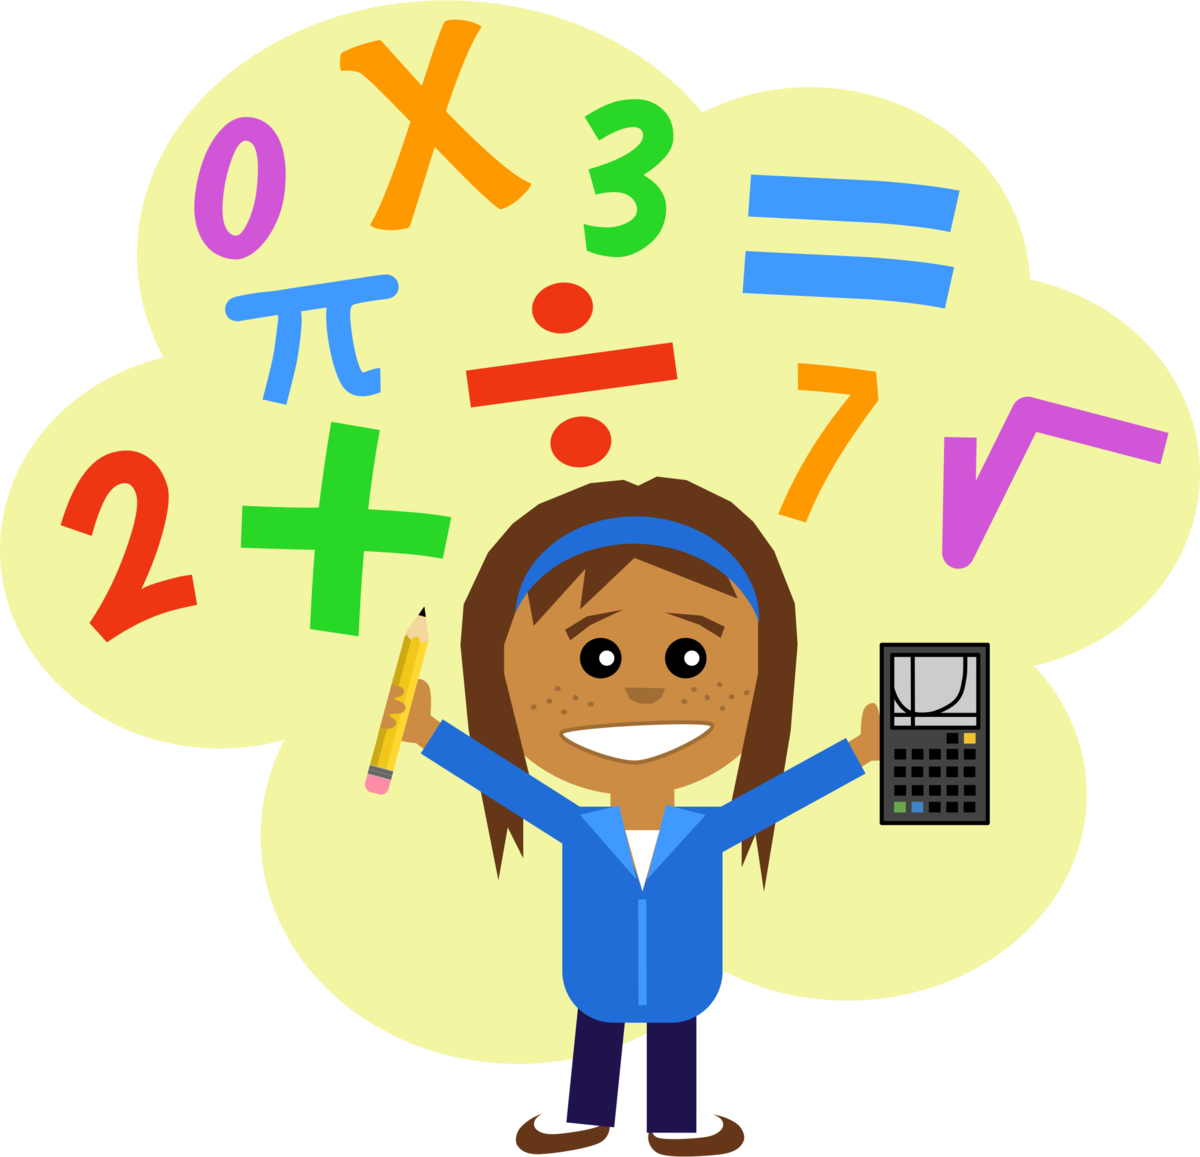 Урок математики картинка без фона